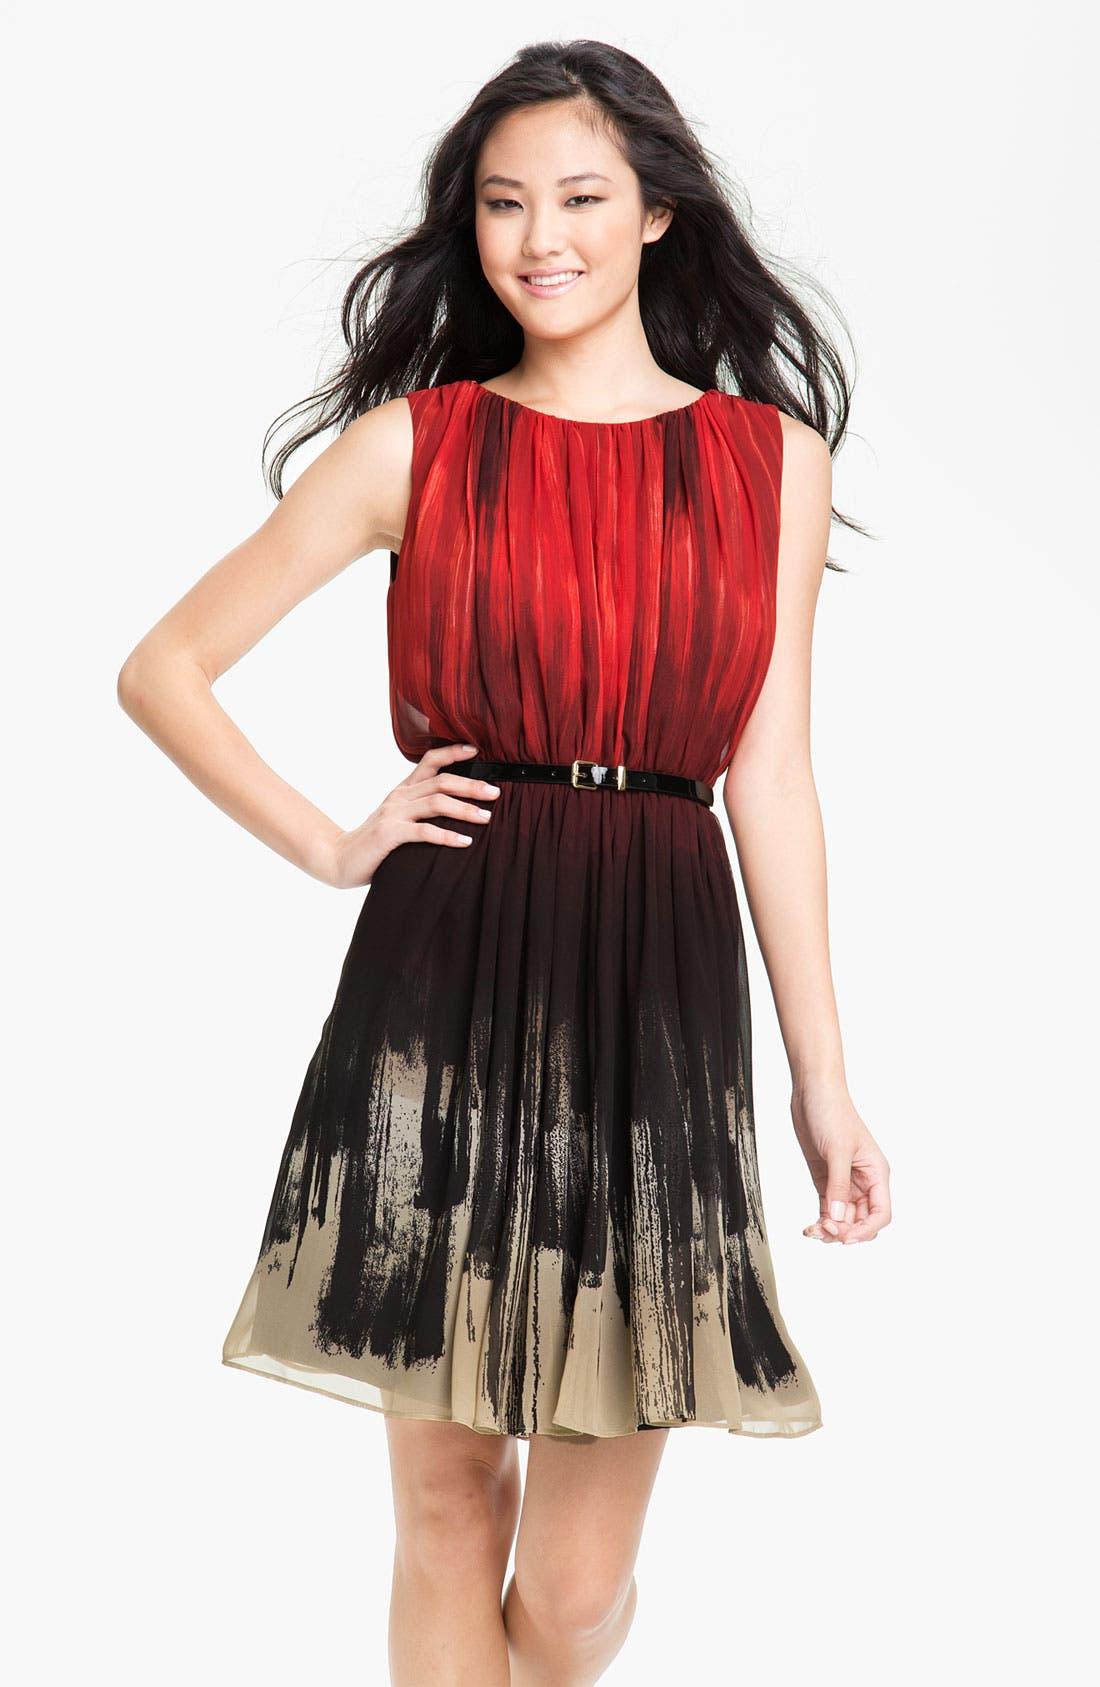 Alternate Image 1 Selected - Calvin Klein Gradient Print Belted Chiffon Dress